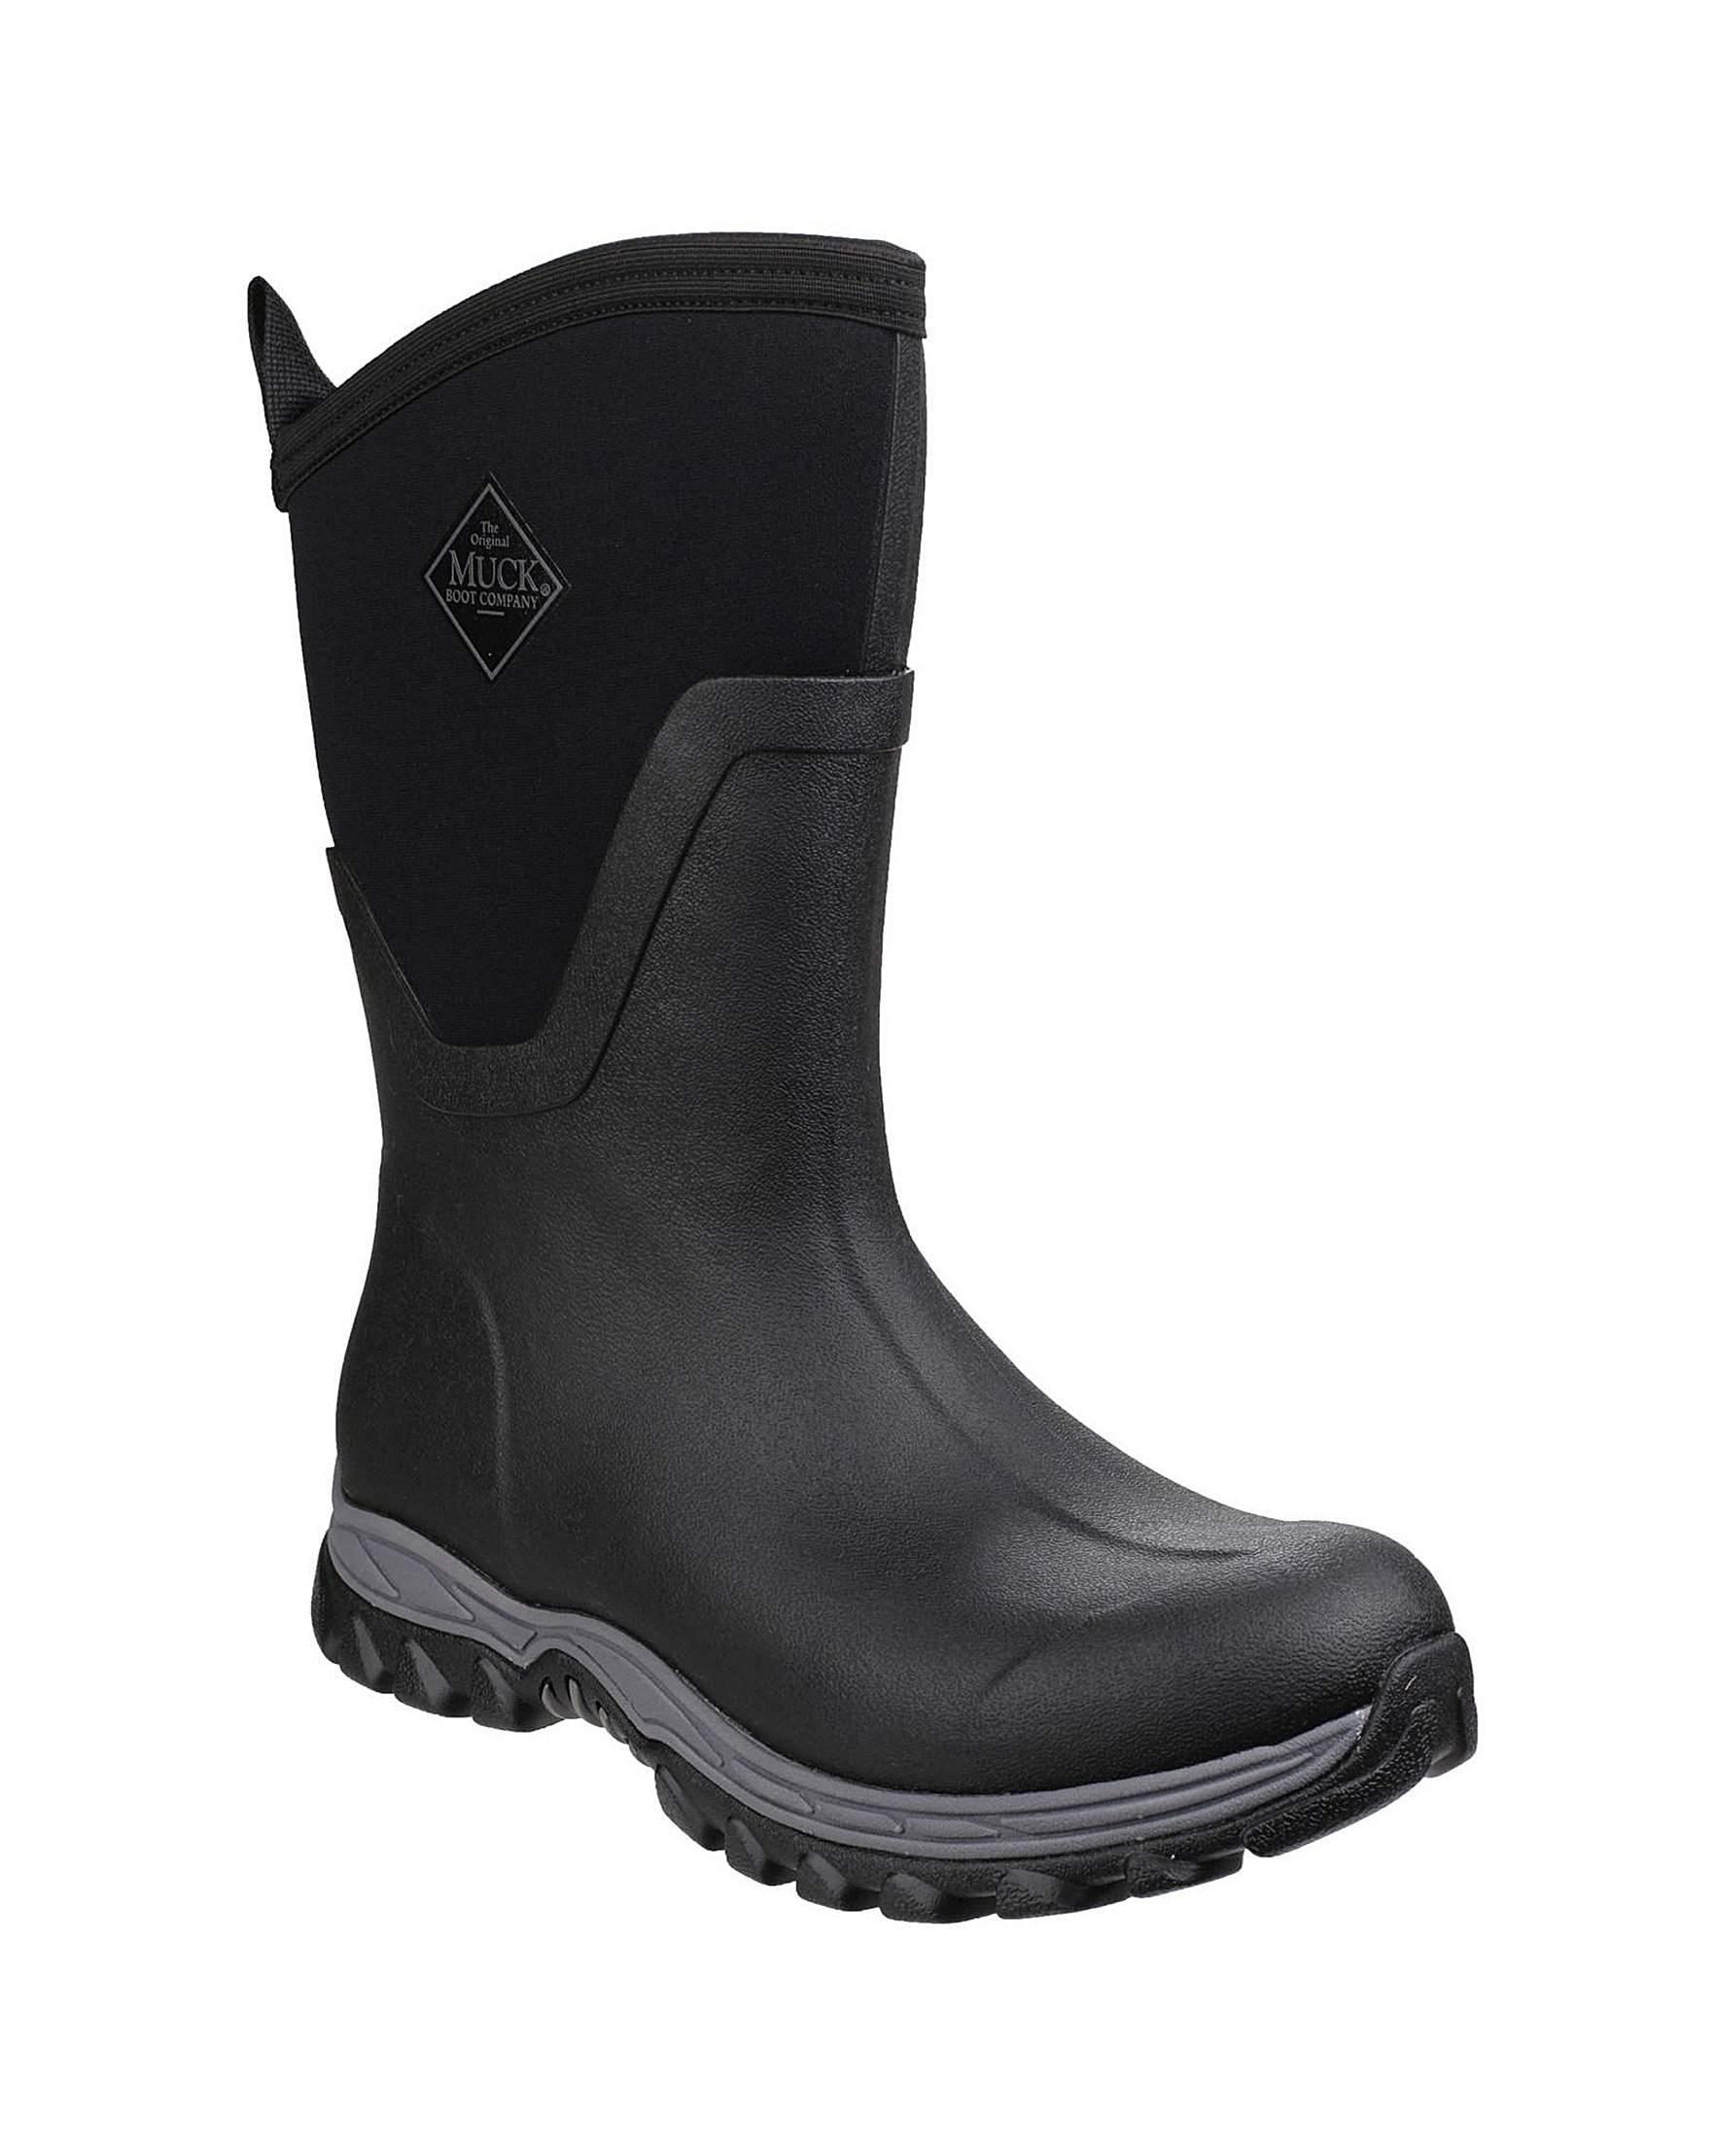 5e9fcdbd7 Muck Boots Arctic Sport Mid Wellington | Oxendales